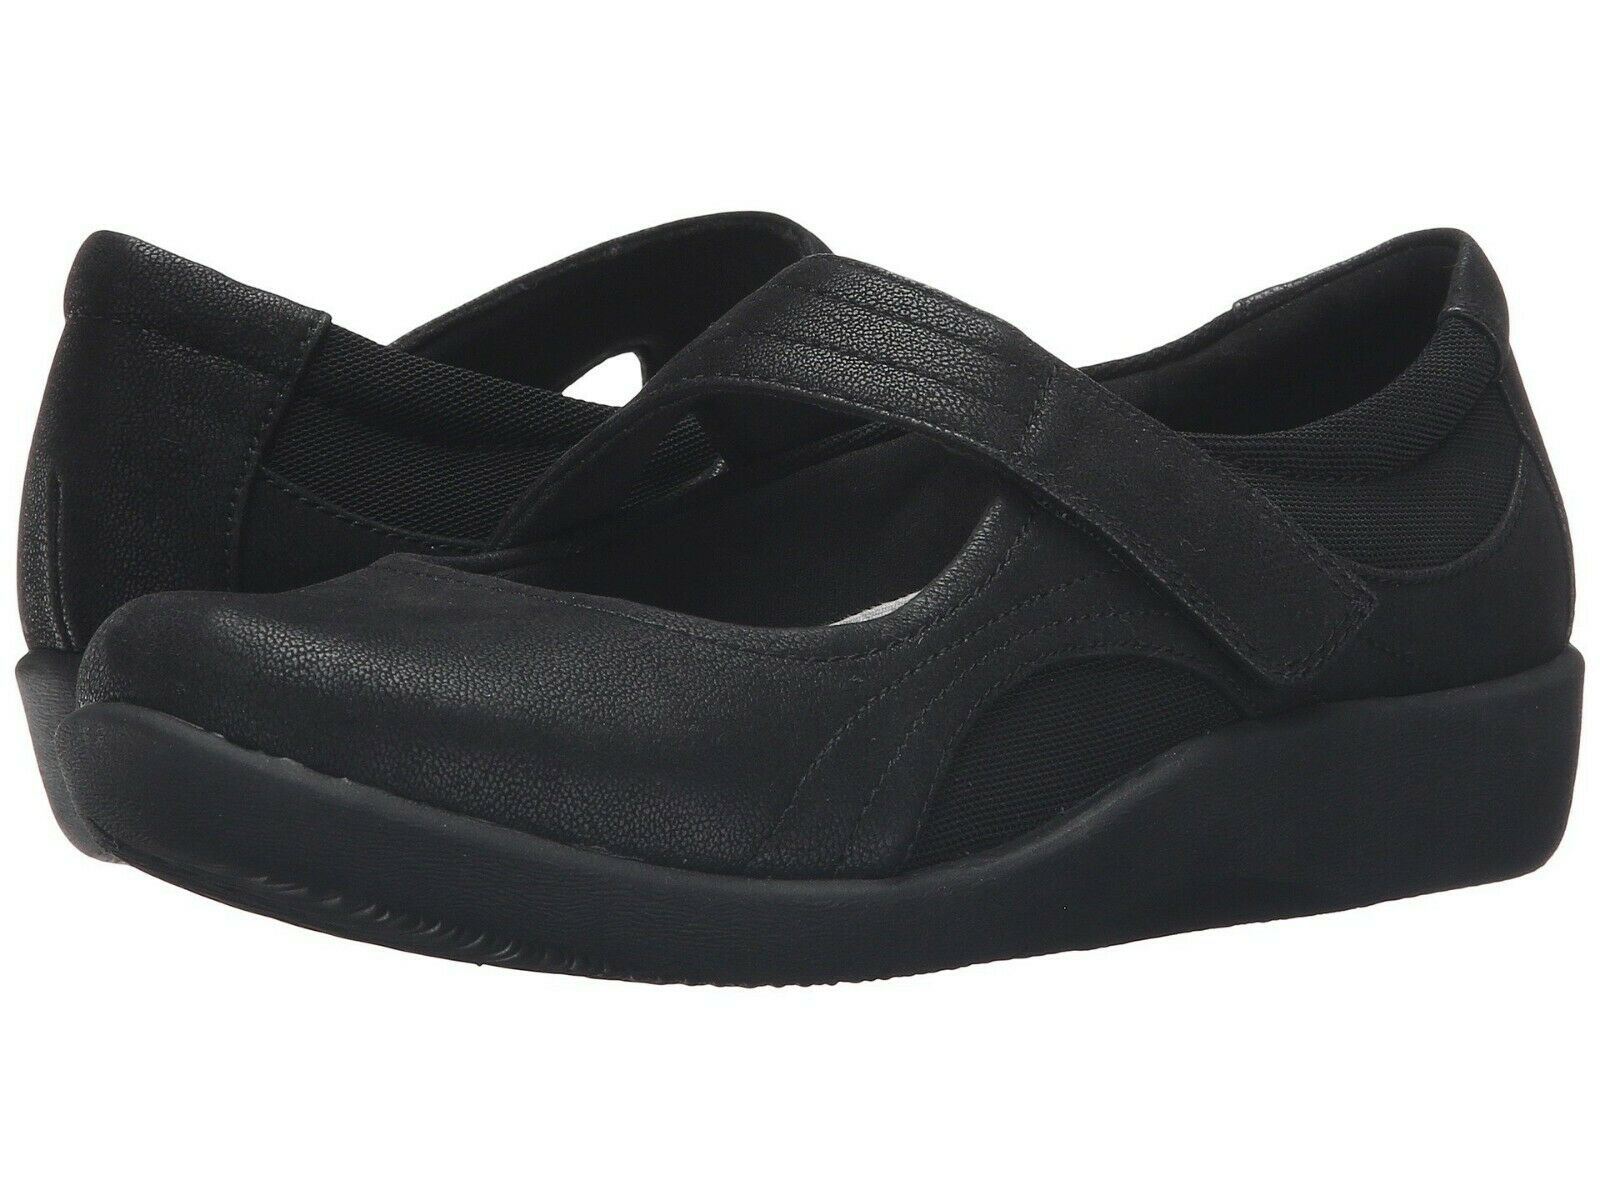 Chaussures femmes Clarks Sillian Bella Casual Mary Jane Flats 21457 noir